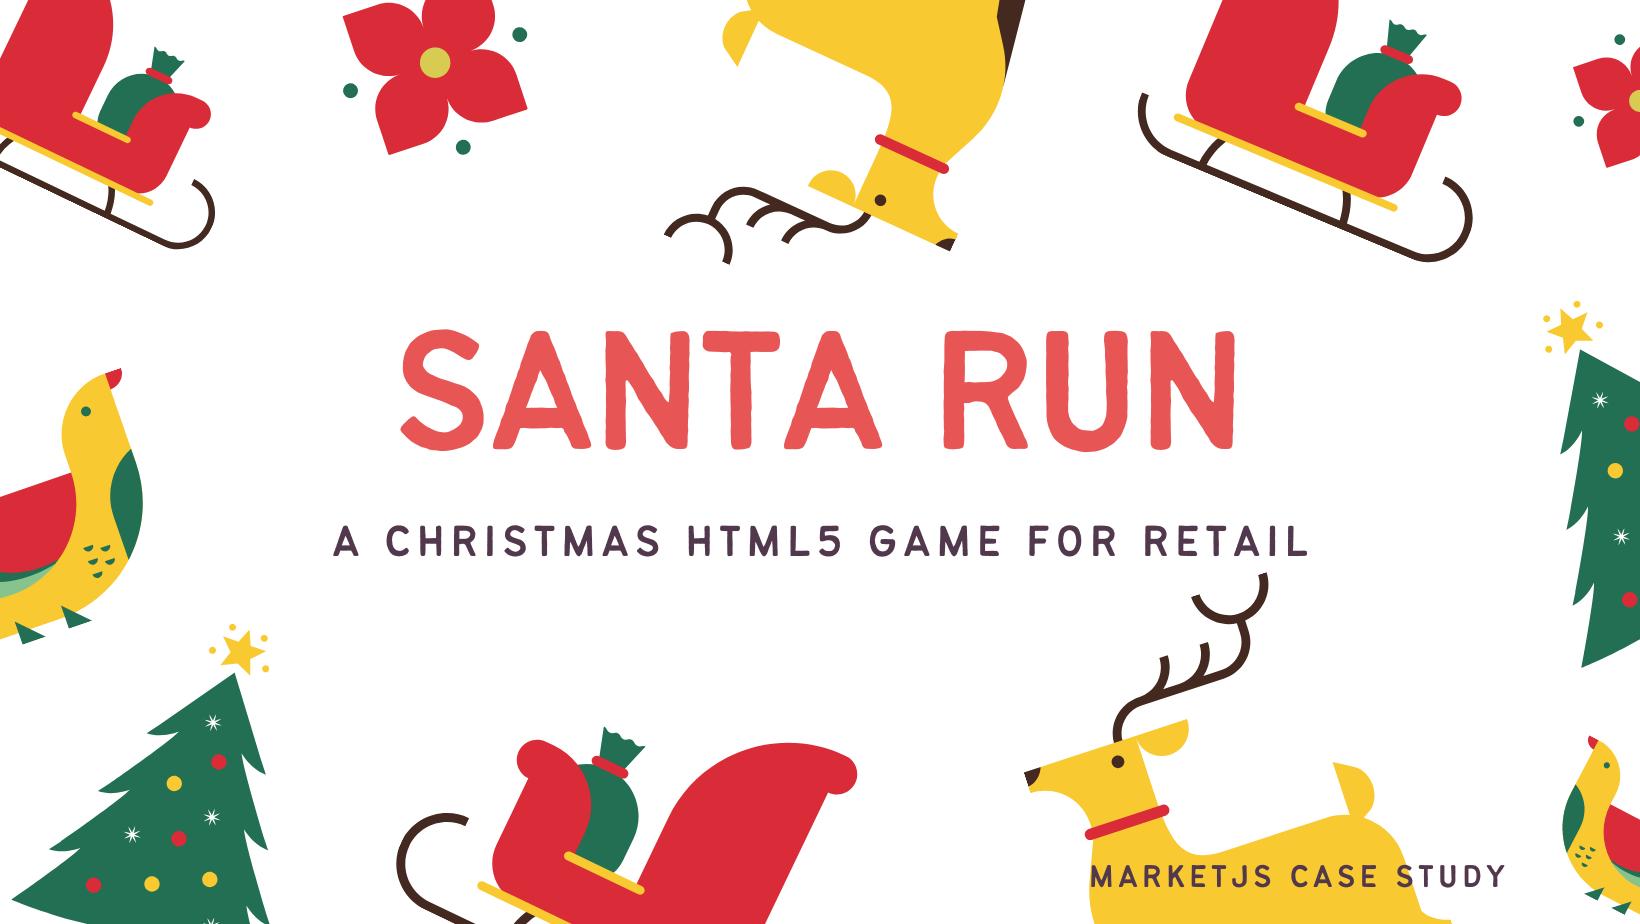 Santa Run A Christmas HTML5 Game For Retail